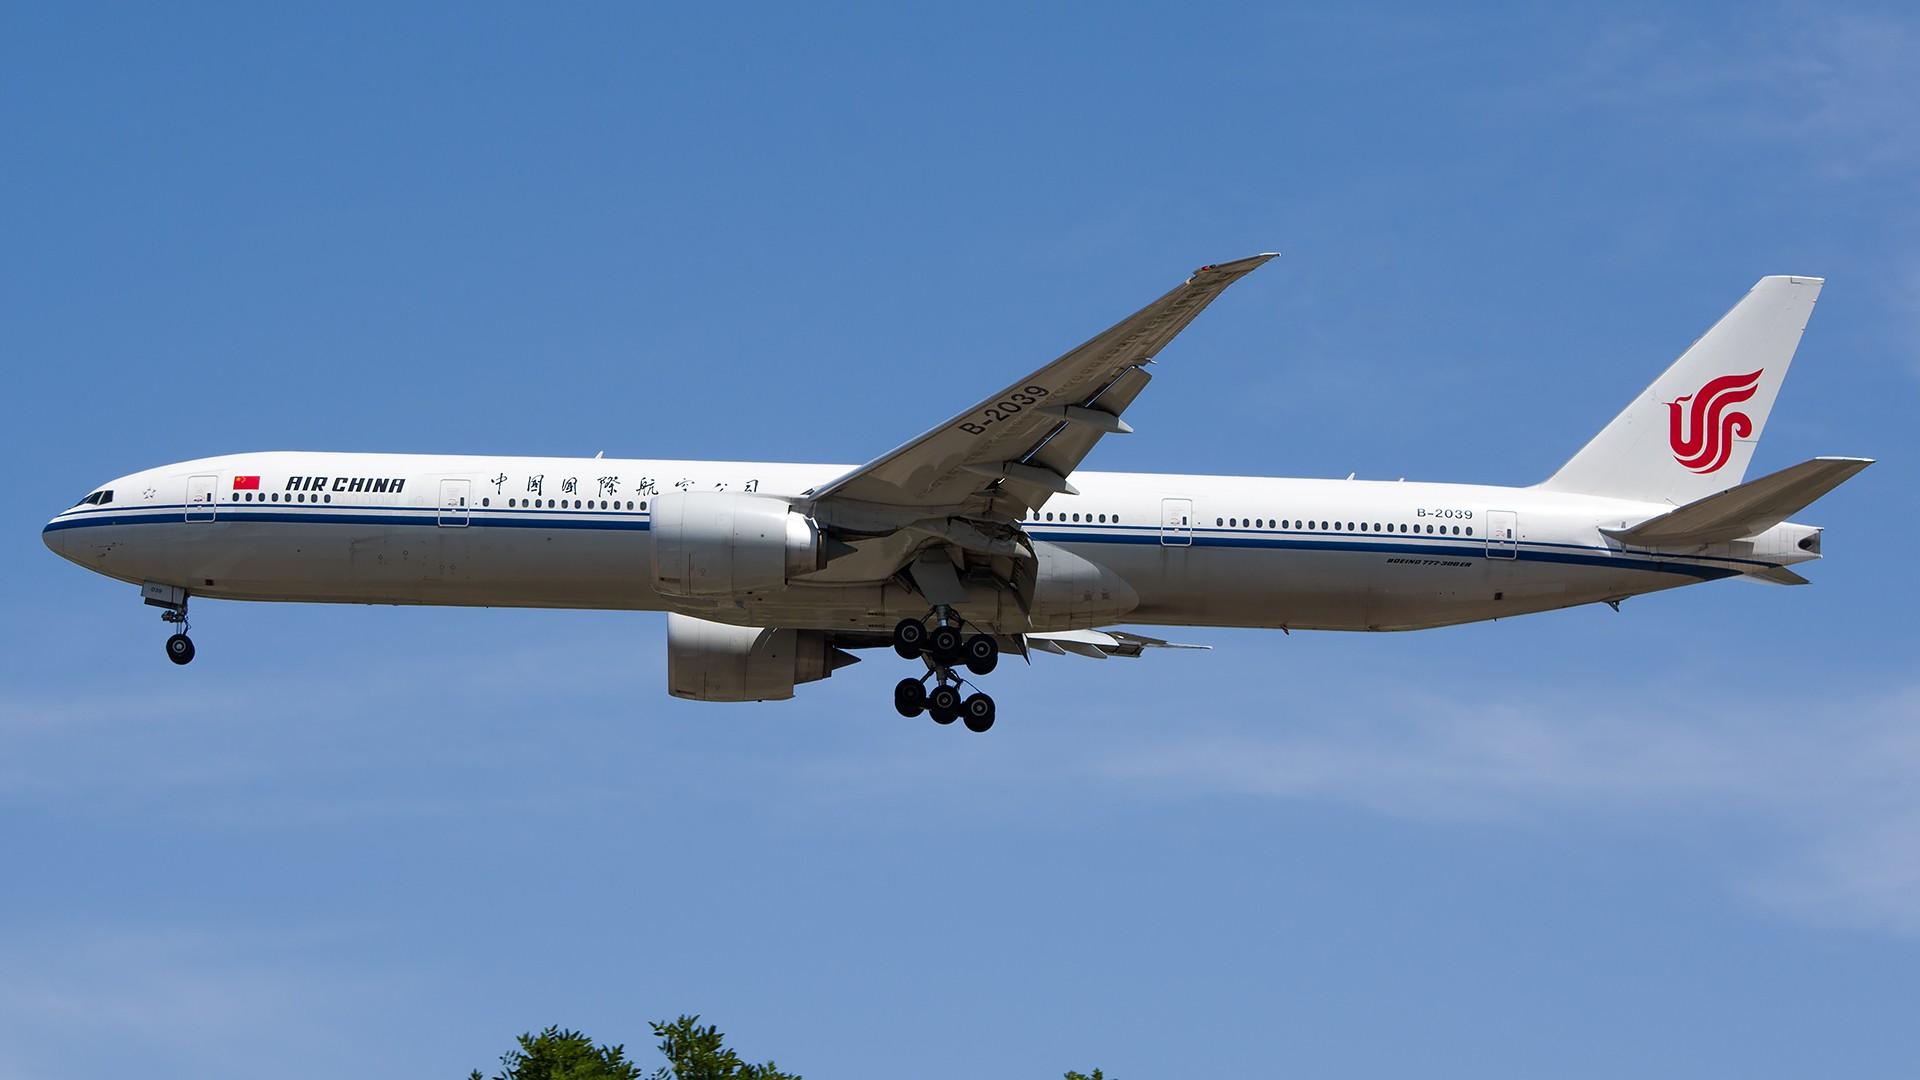 Re:[原创]PEK01午后两小时抓拍,其实是为AA的One World来的 BOEING 777-300ER B-2039 中国北京首都国际机场